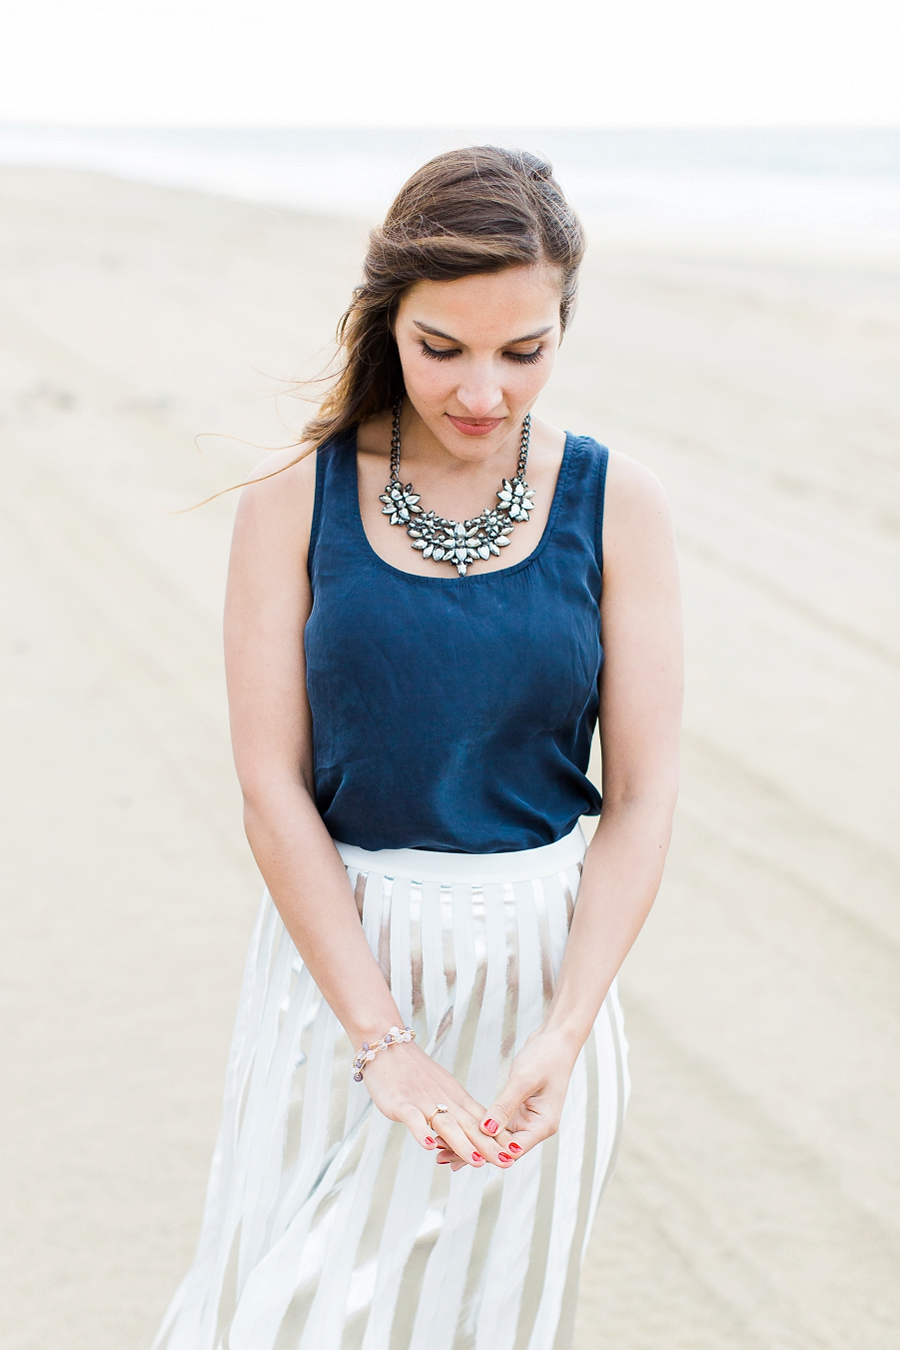 Fuerteventura-Beach-Engagement-Tanja Kibogo_ (2).JPG